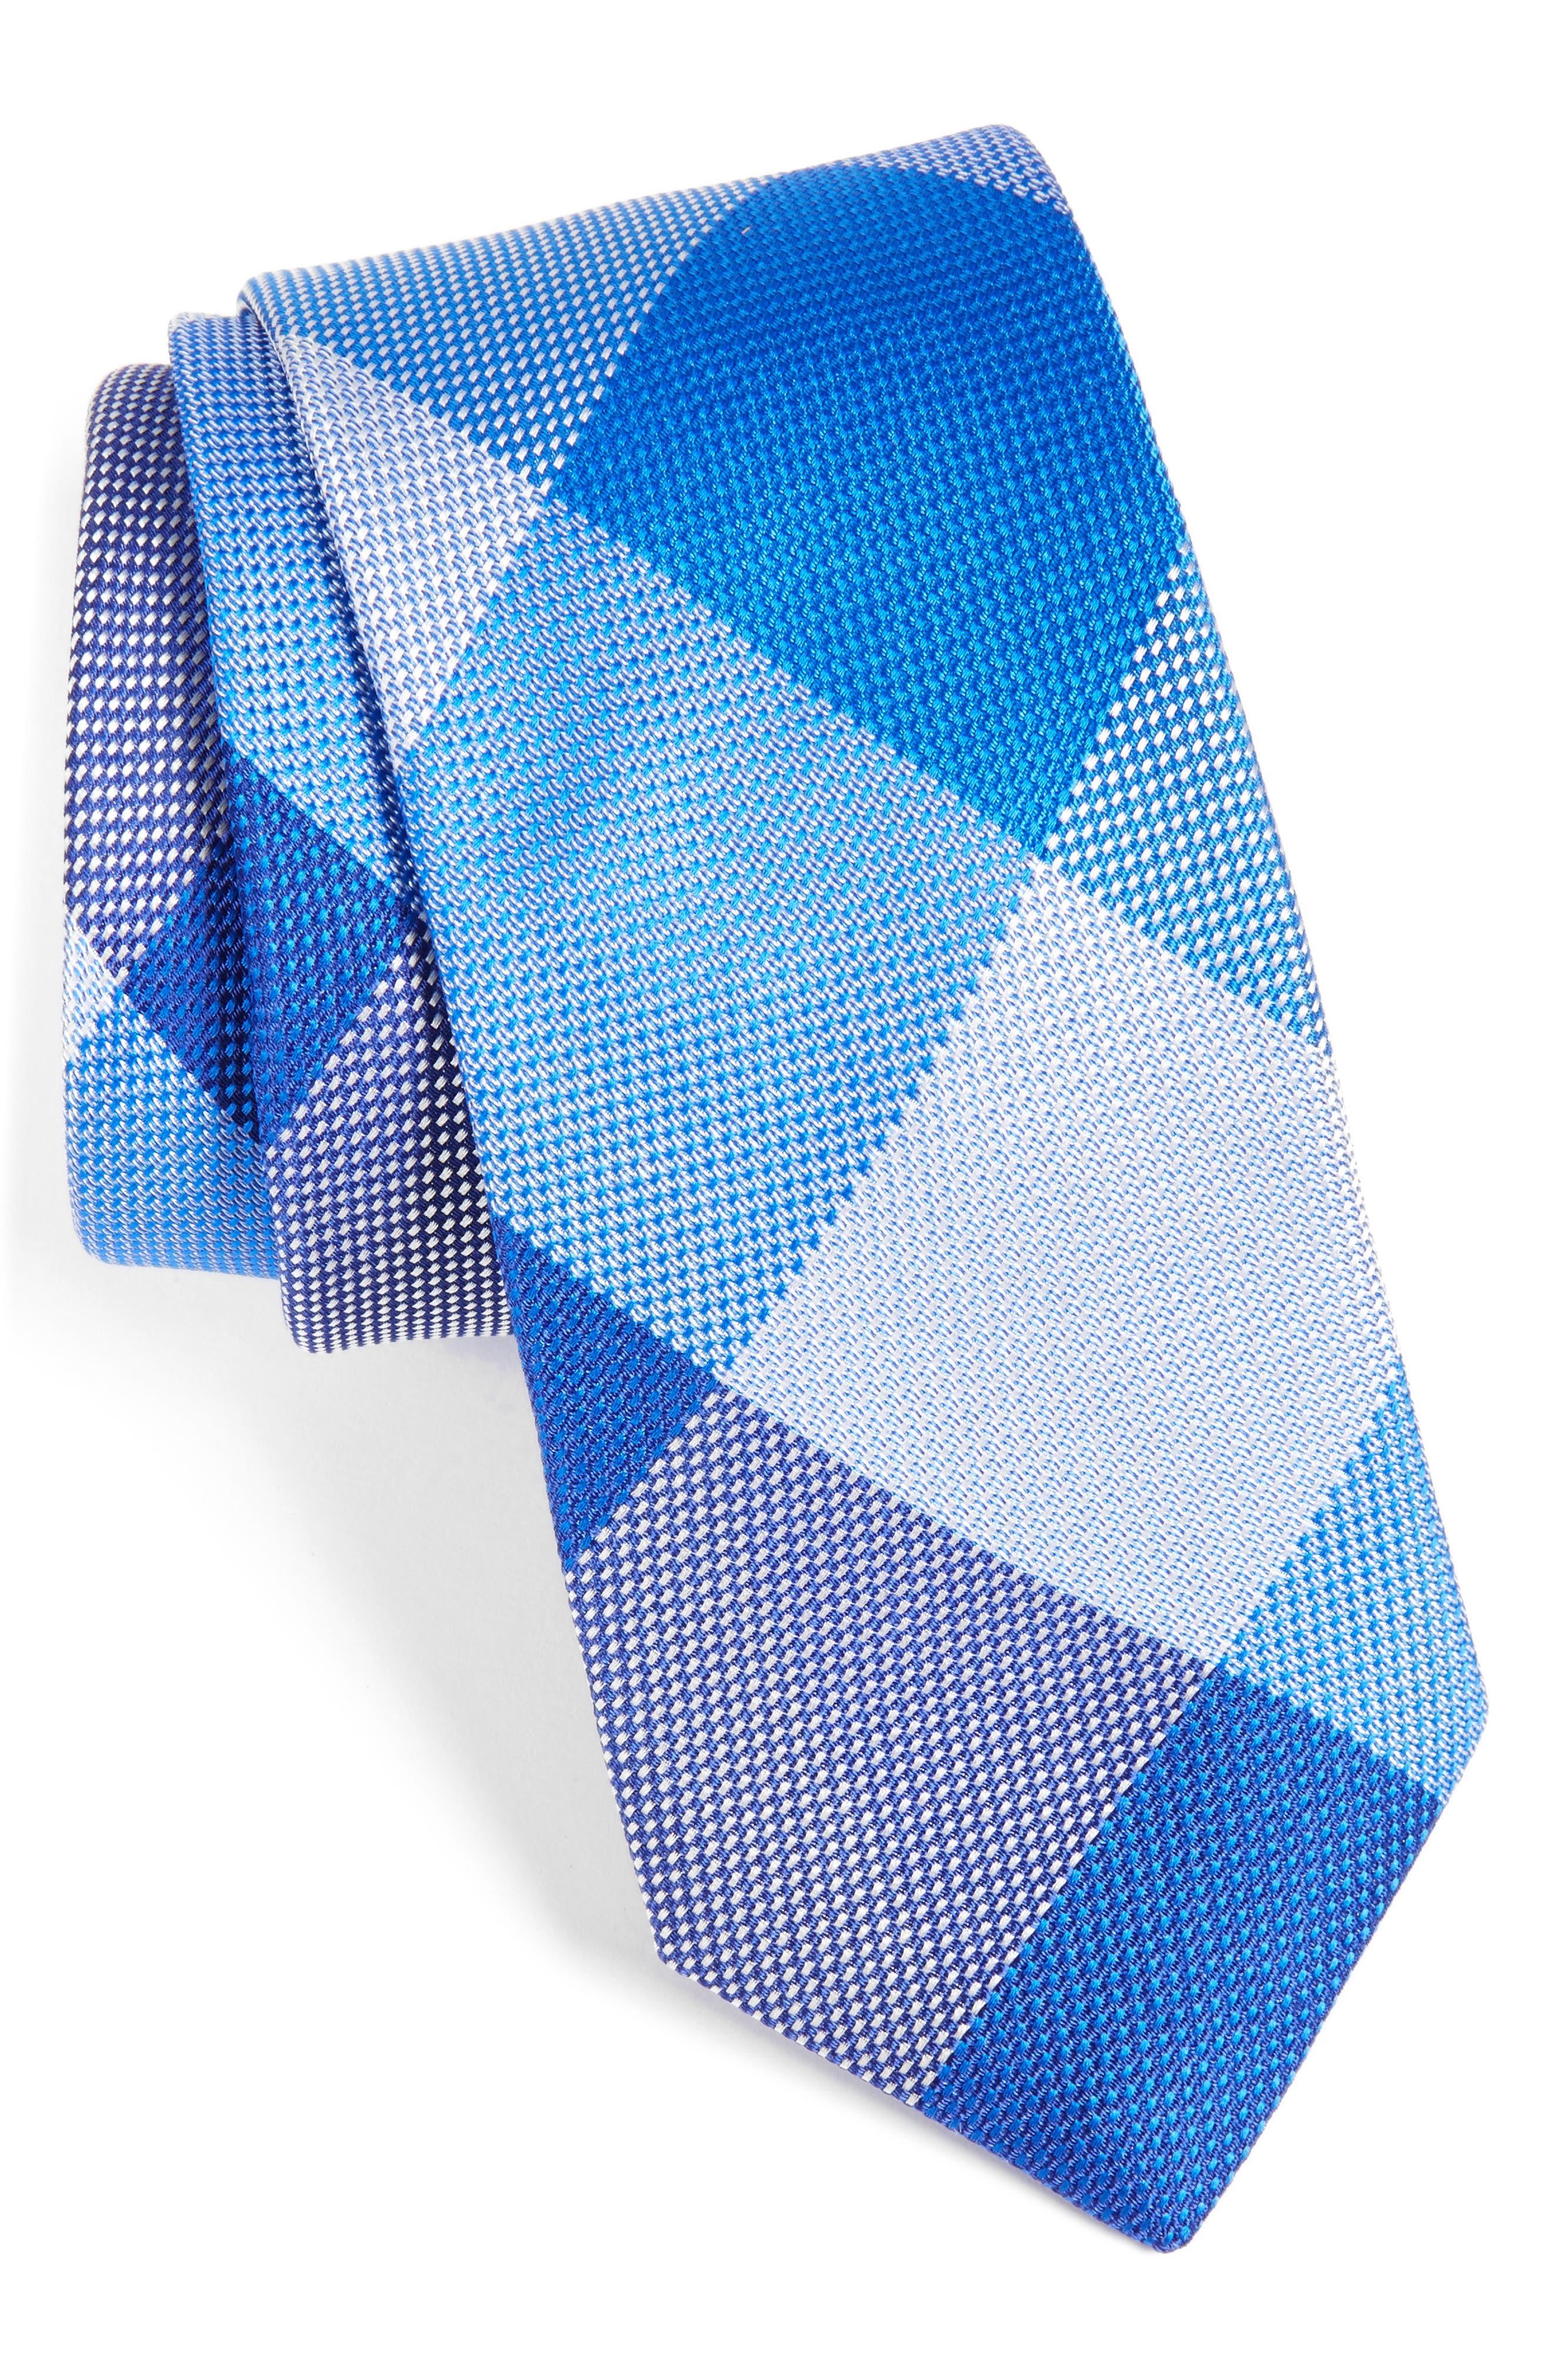 Plaid Silk Tie,                             Main thumbnail 1, color,                             400